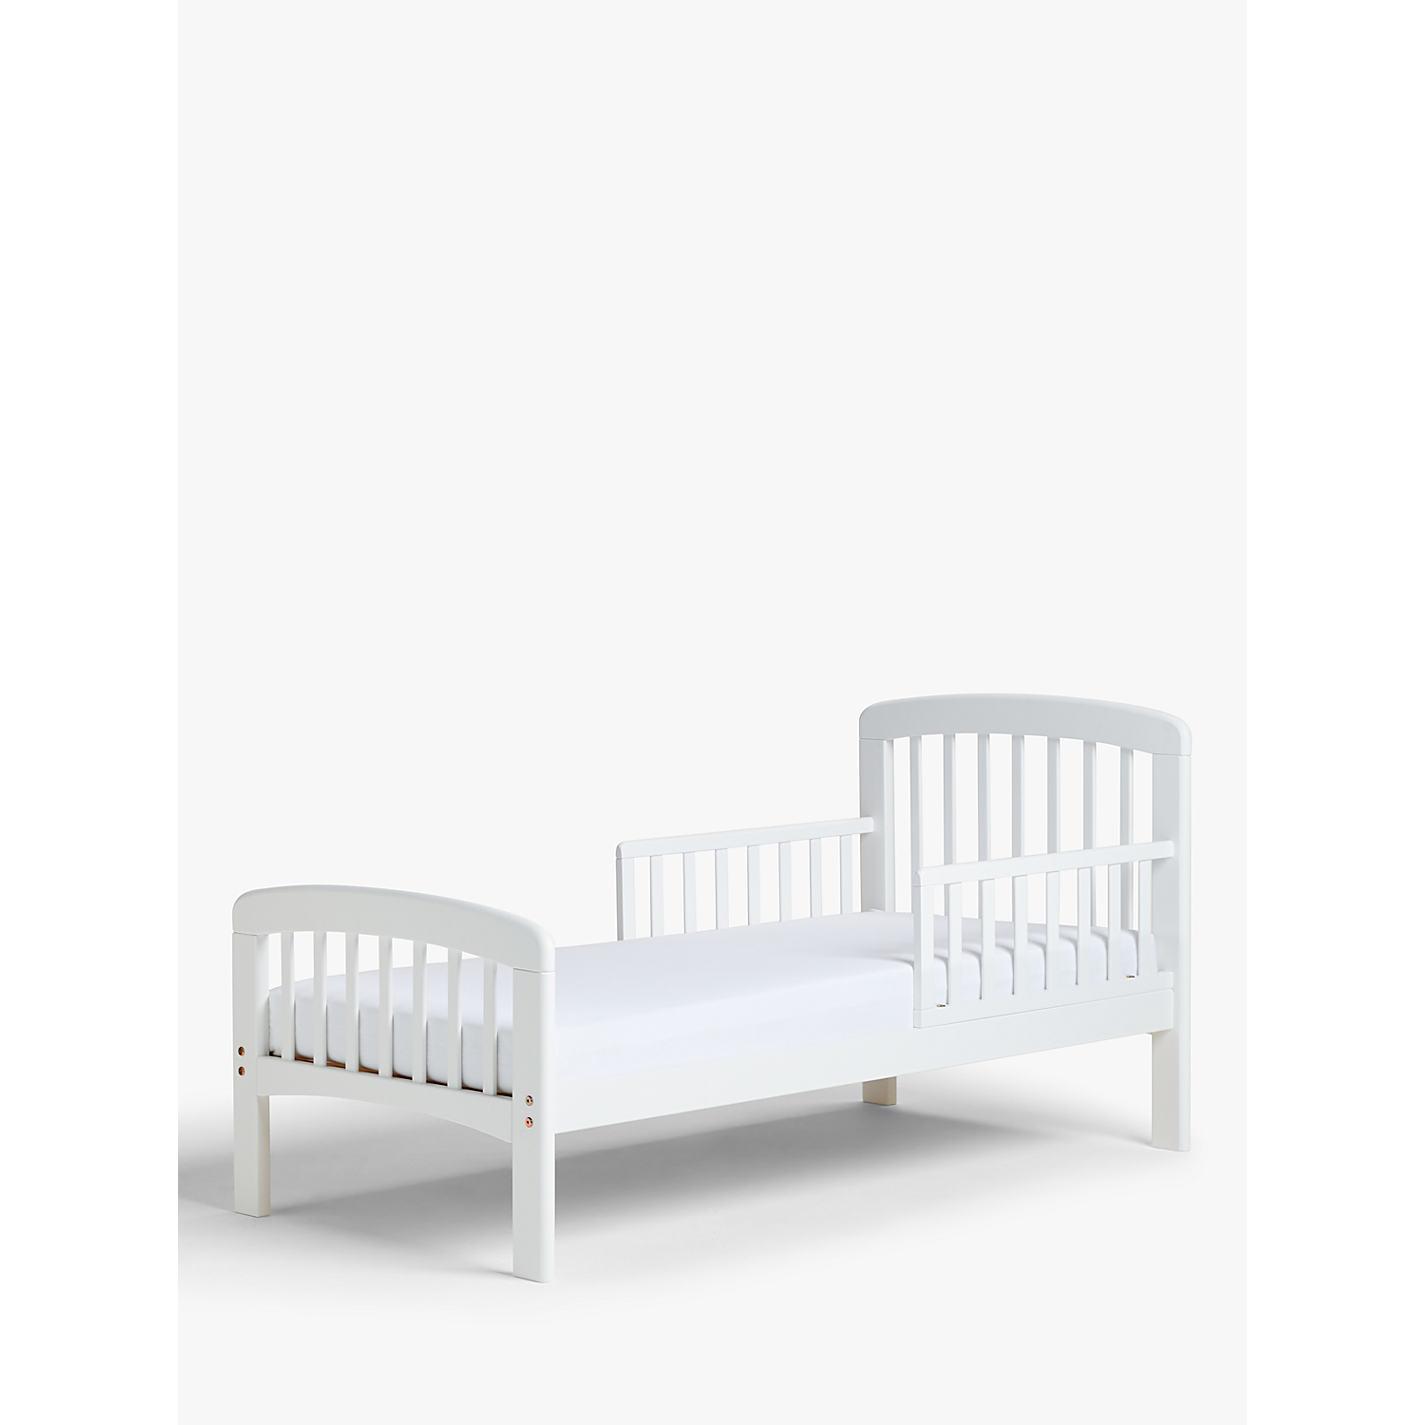 John lewis childrens bedrooms for John lewis bedroom ideas